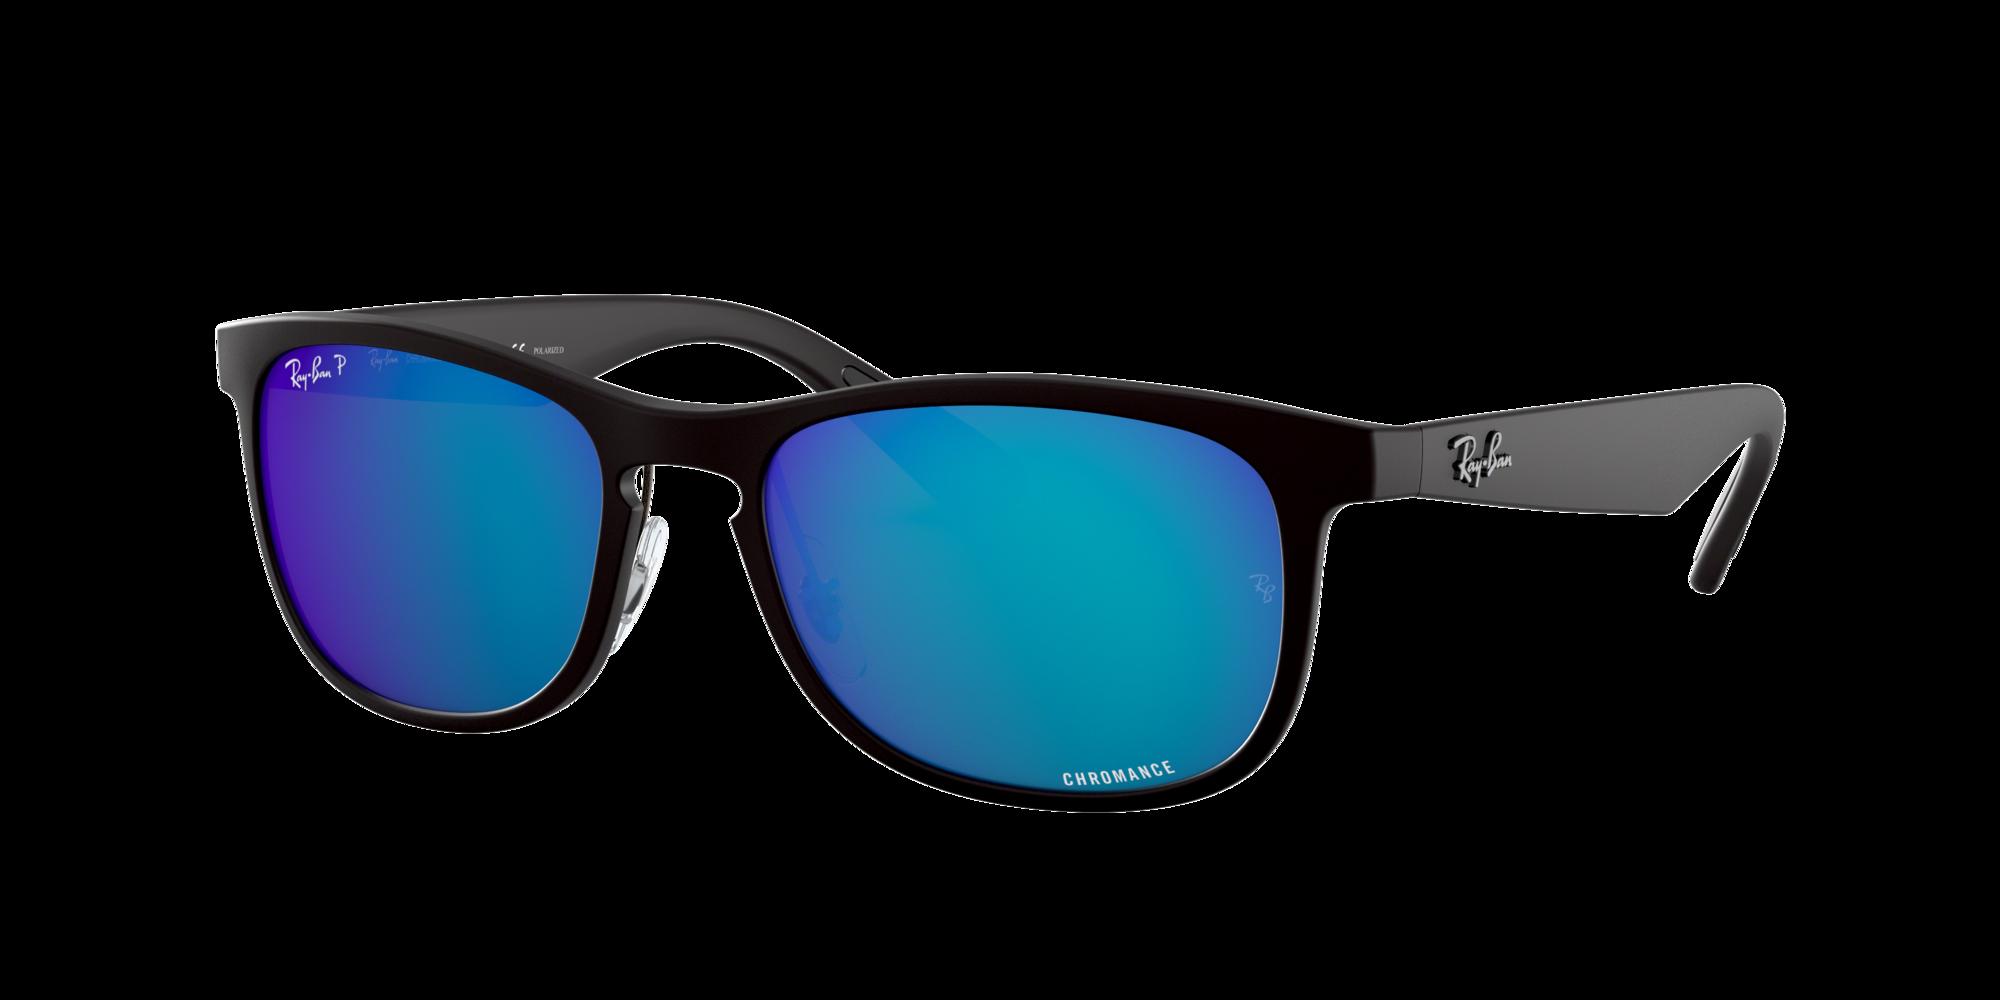 Ray Ban Man  RB4263 Chromance -  Frame color: Black, Lens color: Blue Mirror, Size 55-18/145